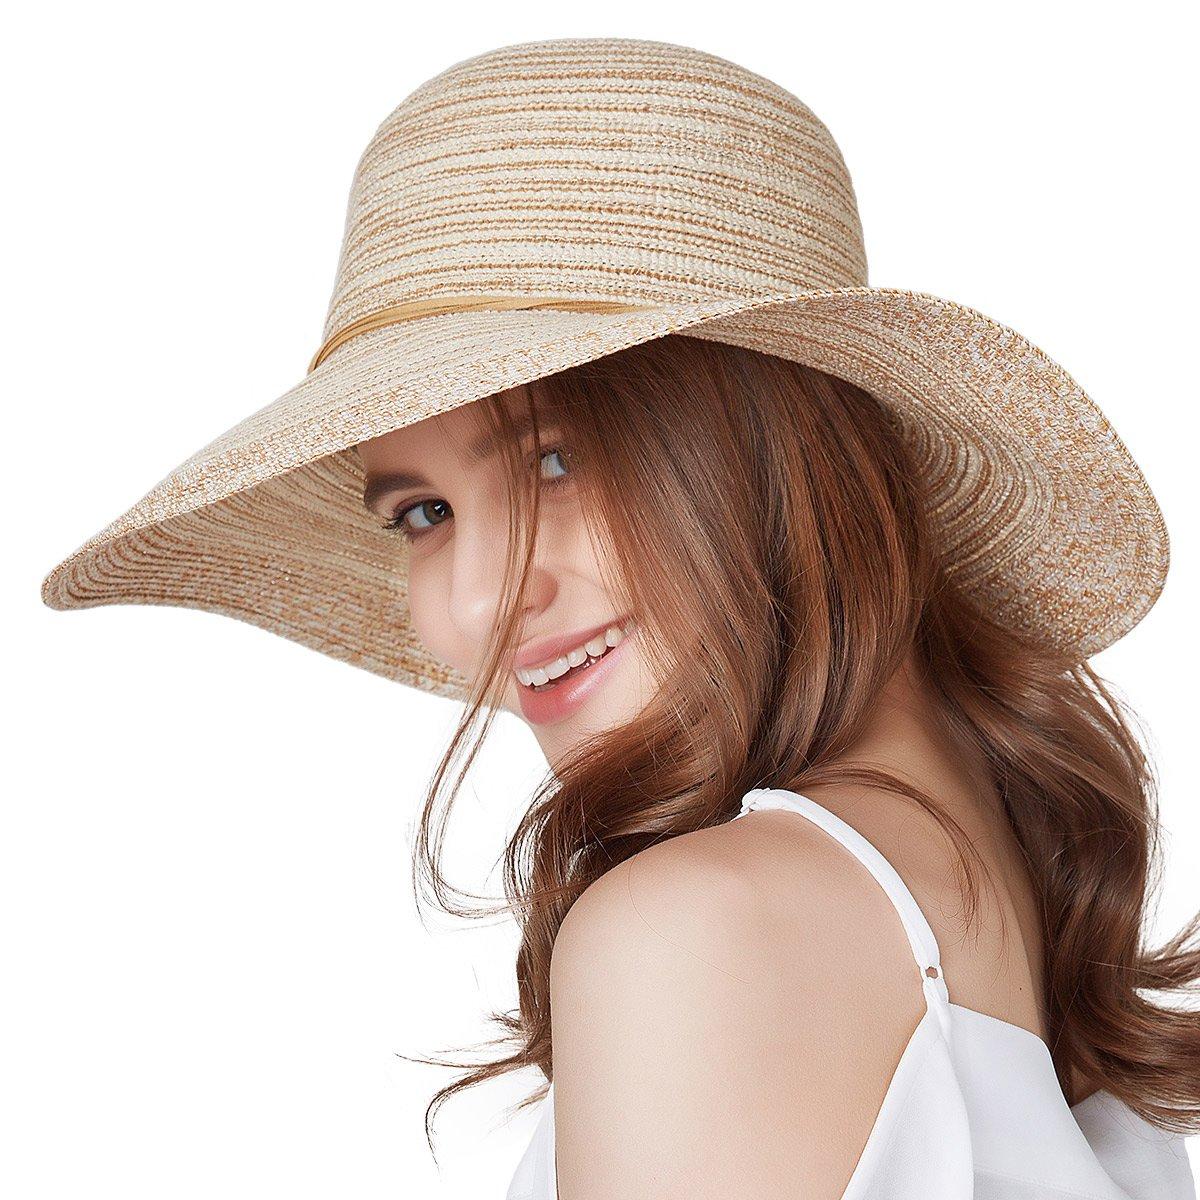 SOMALER Women Floppy Sun Hat Summer Wide Brim Beach Cap Packable Cotton Straw Hat for Travel by SOMALER (Image #2)